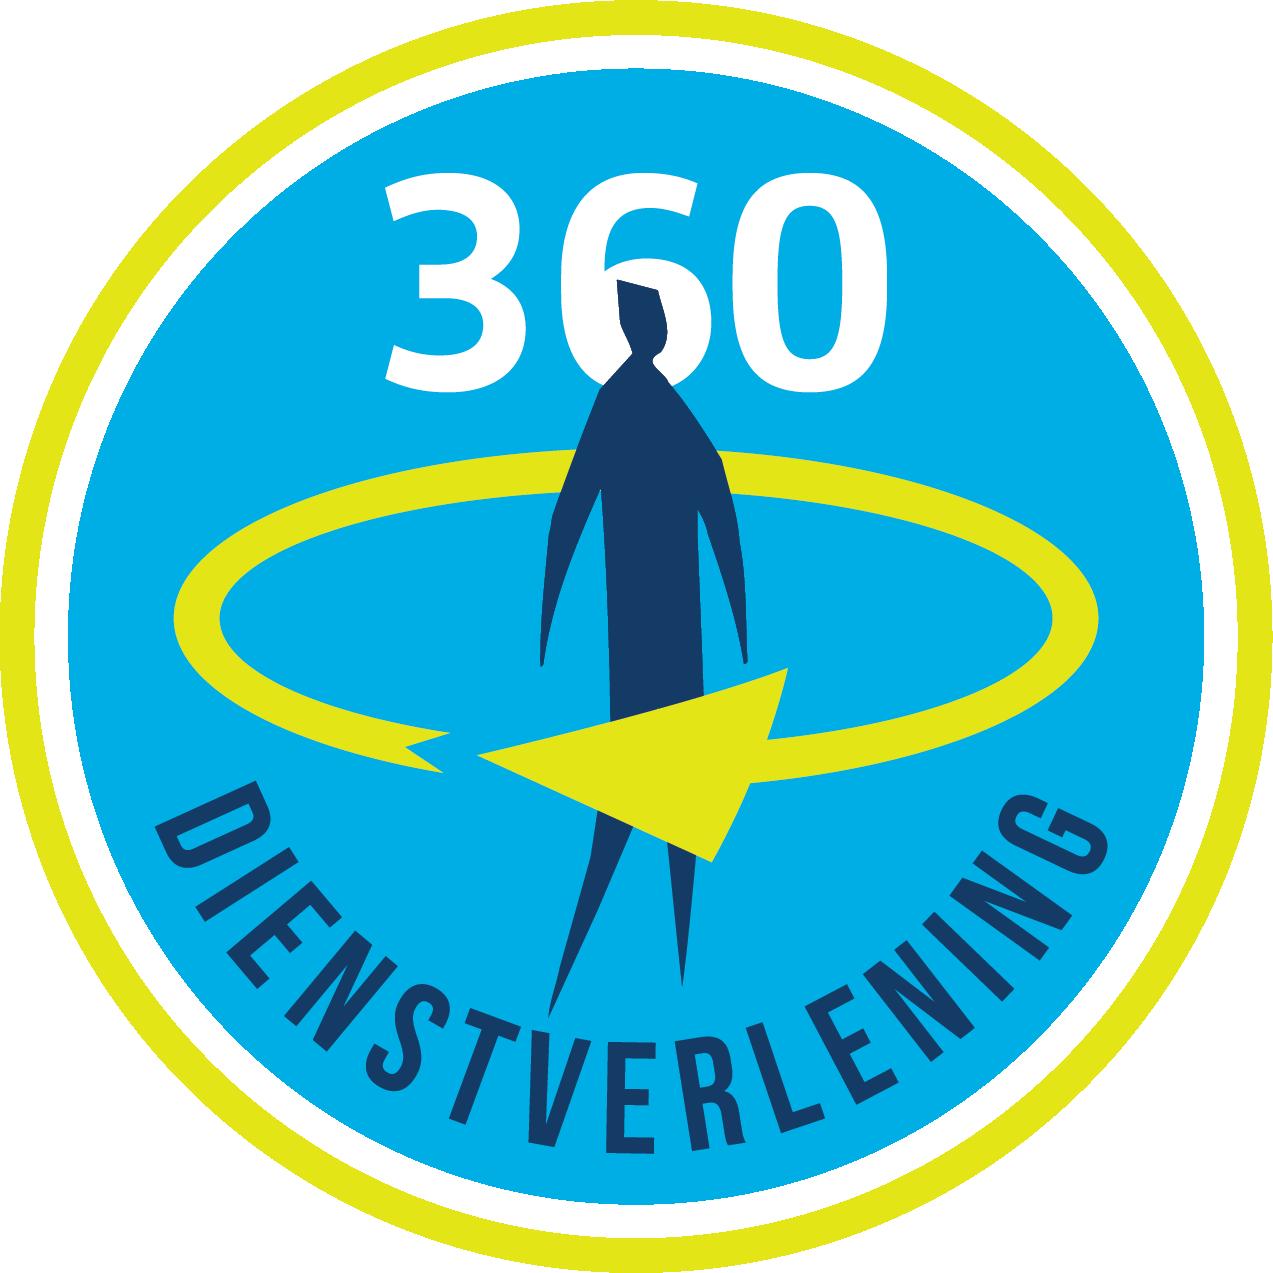 aclvb-universele_diensten-logo-cmyk_ok-2_0.png